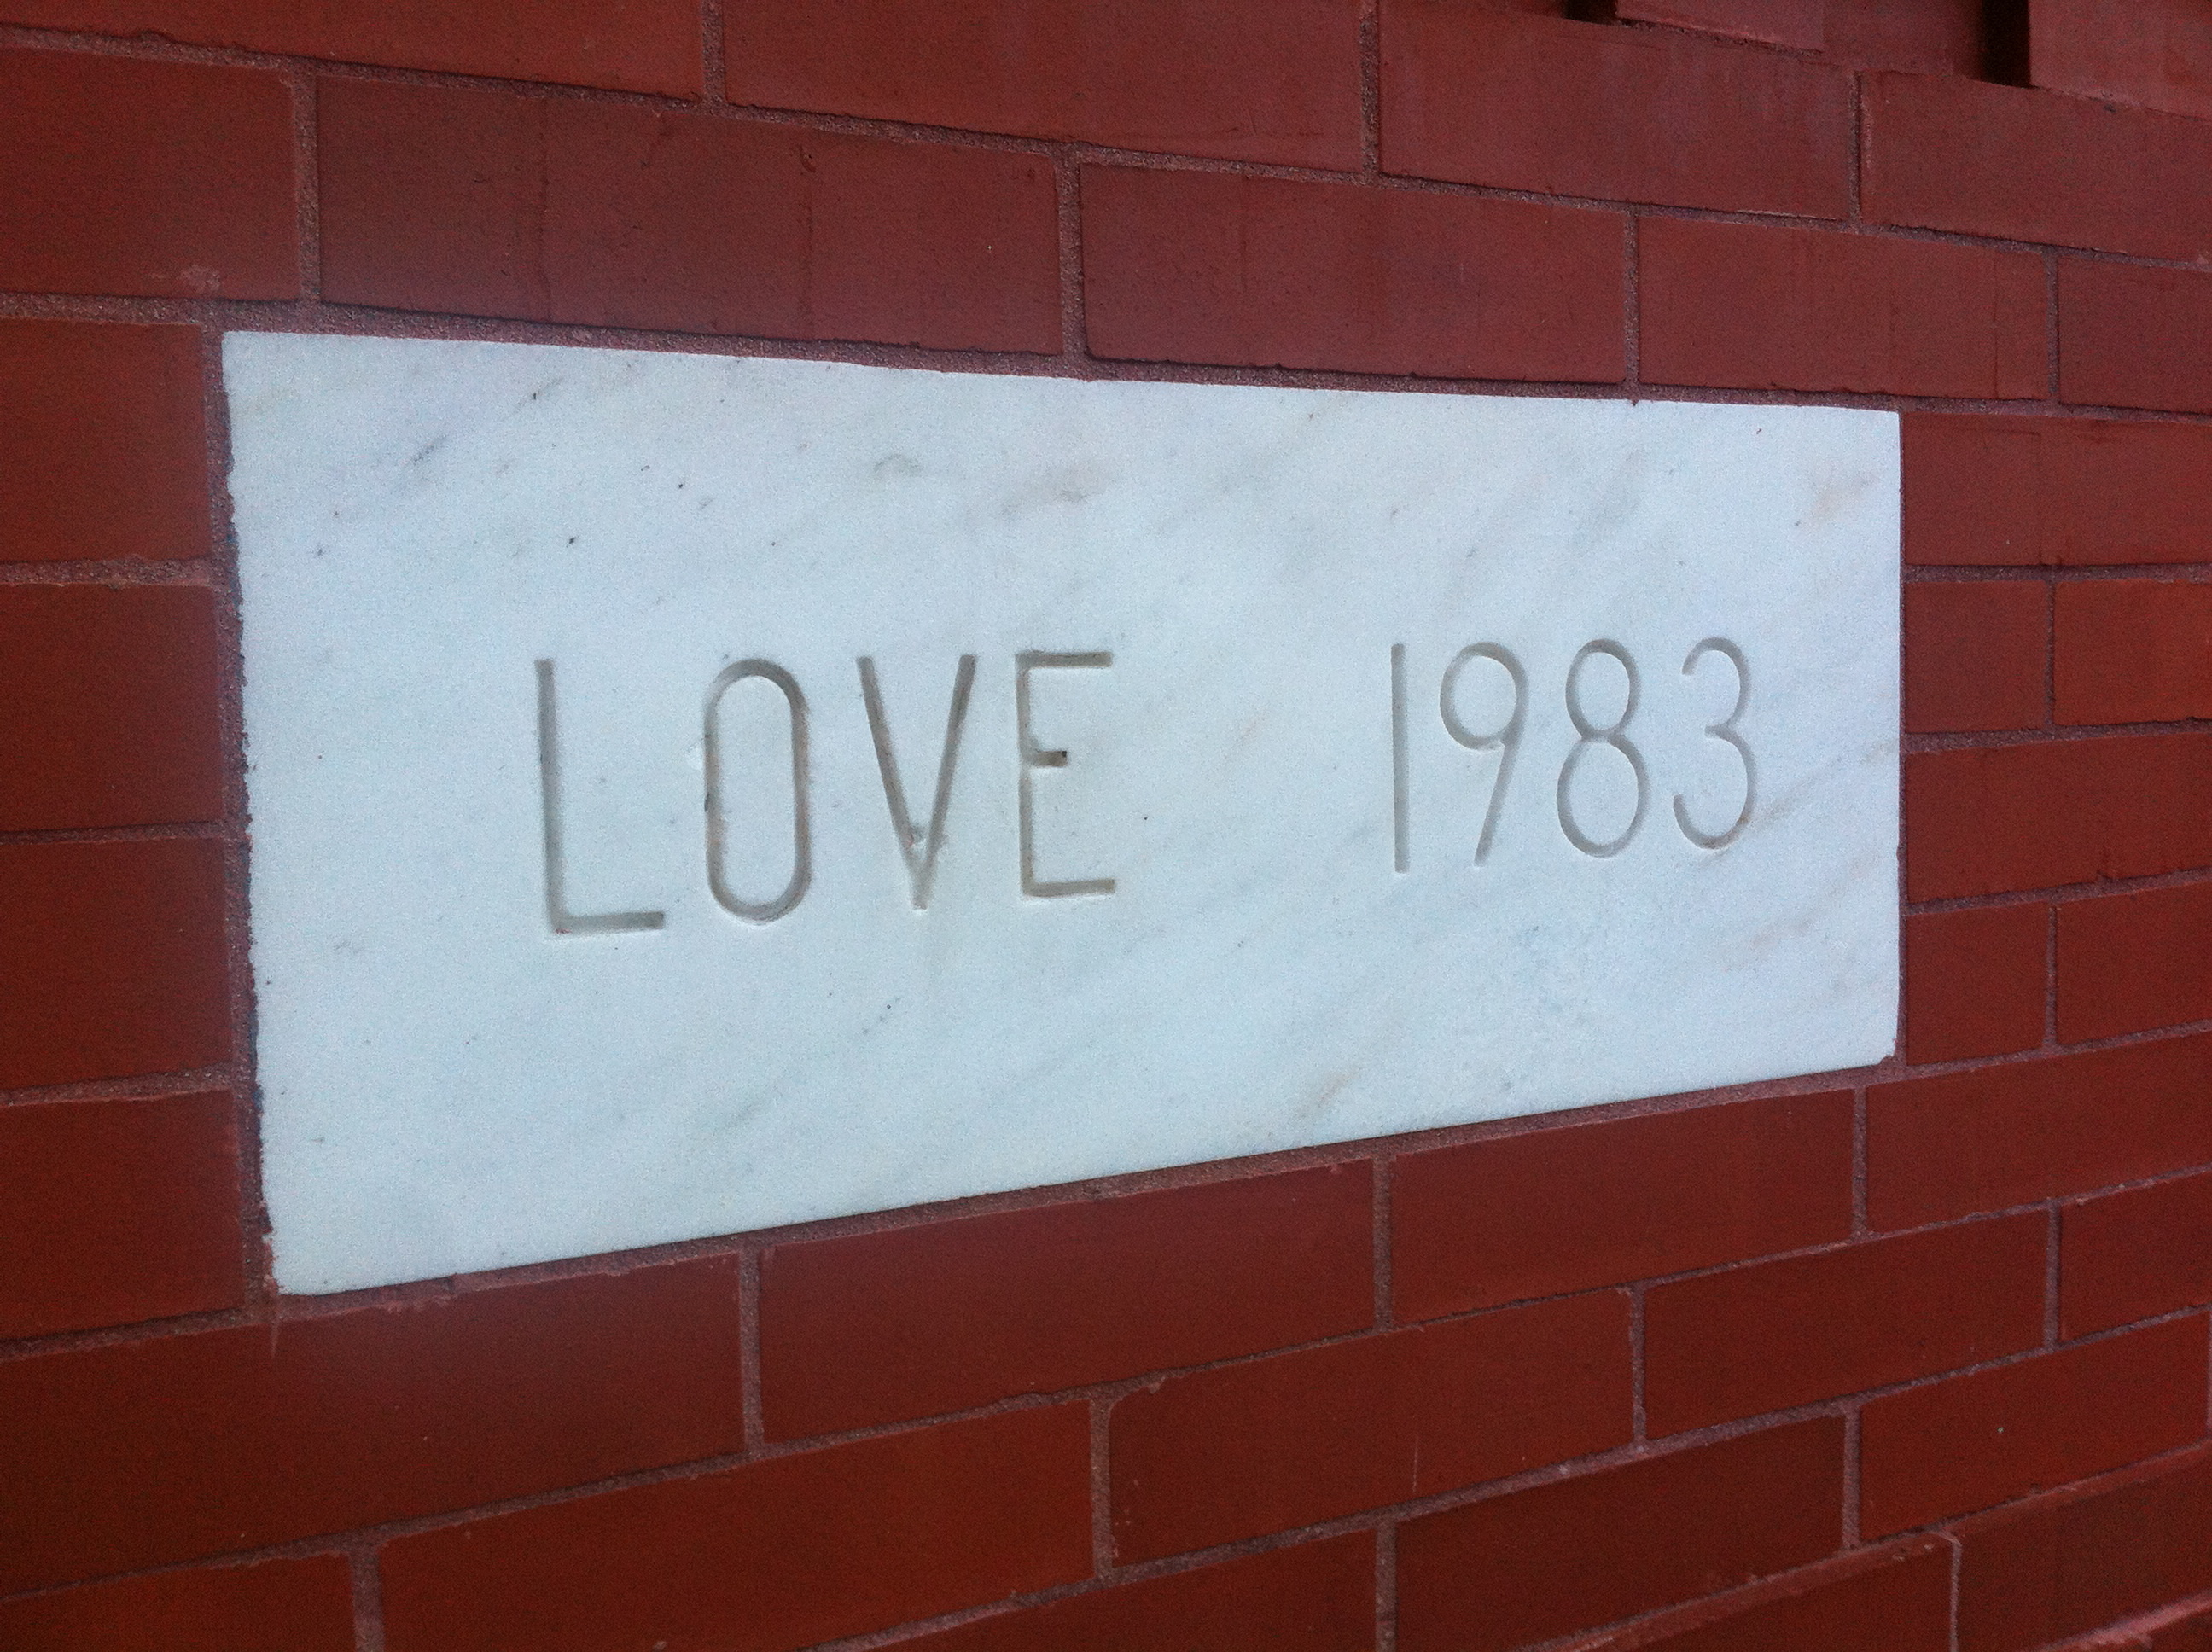 NYC Foodie Trip Day 3 - Love 1983